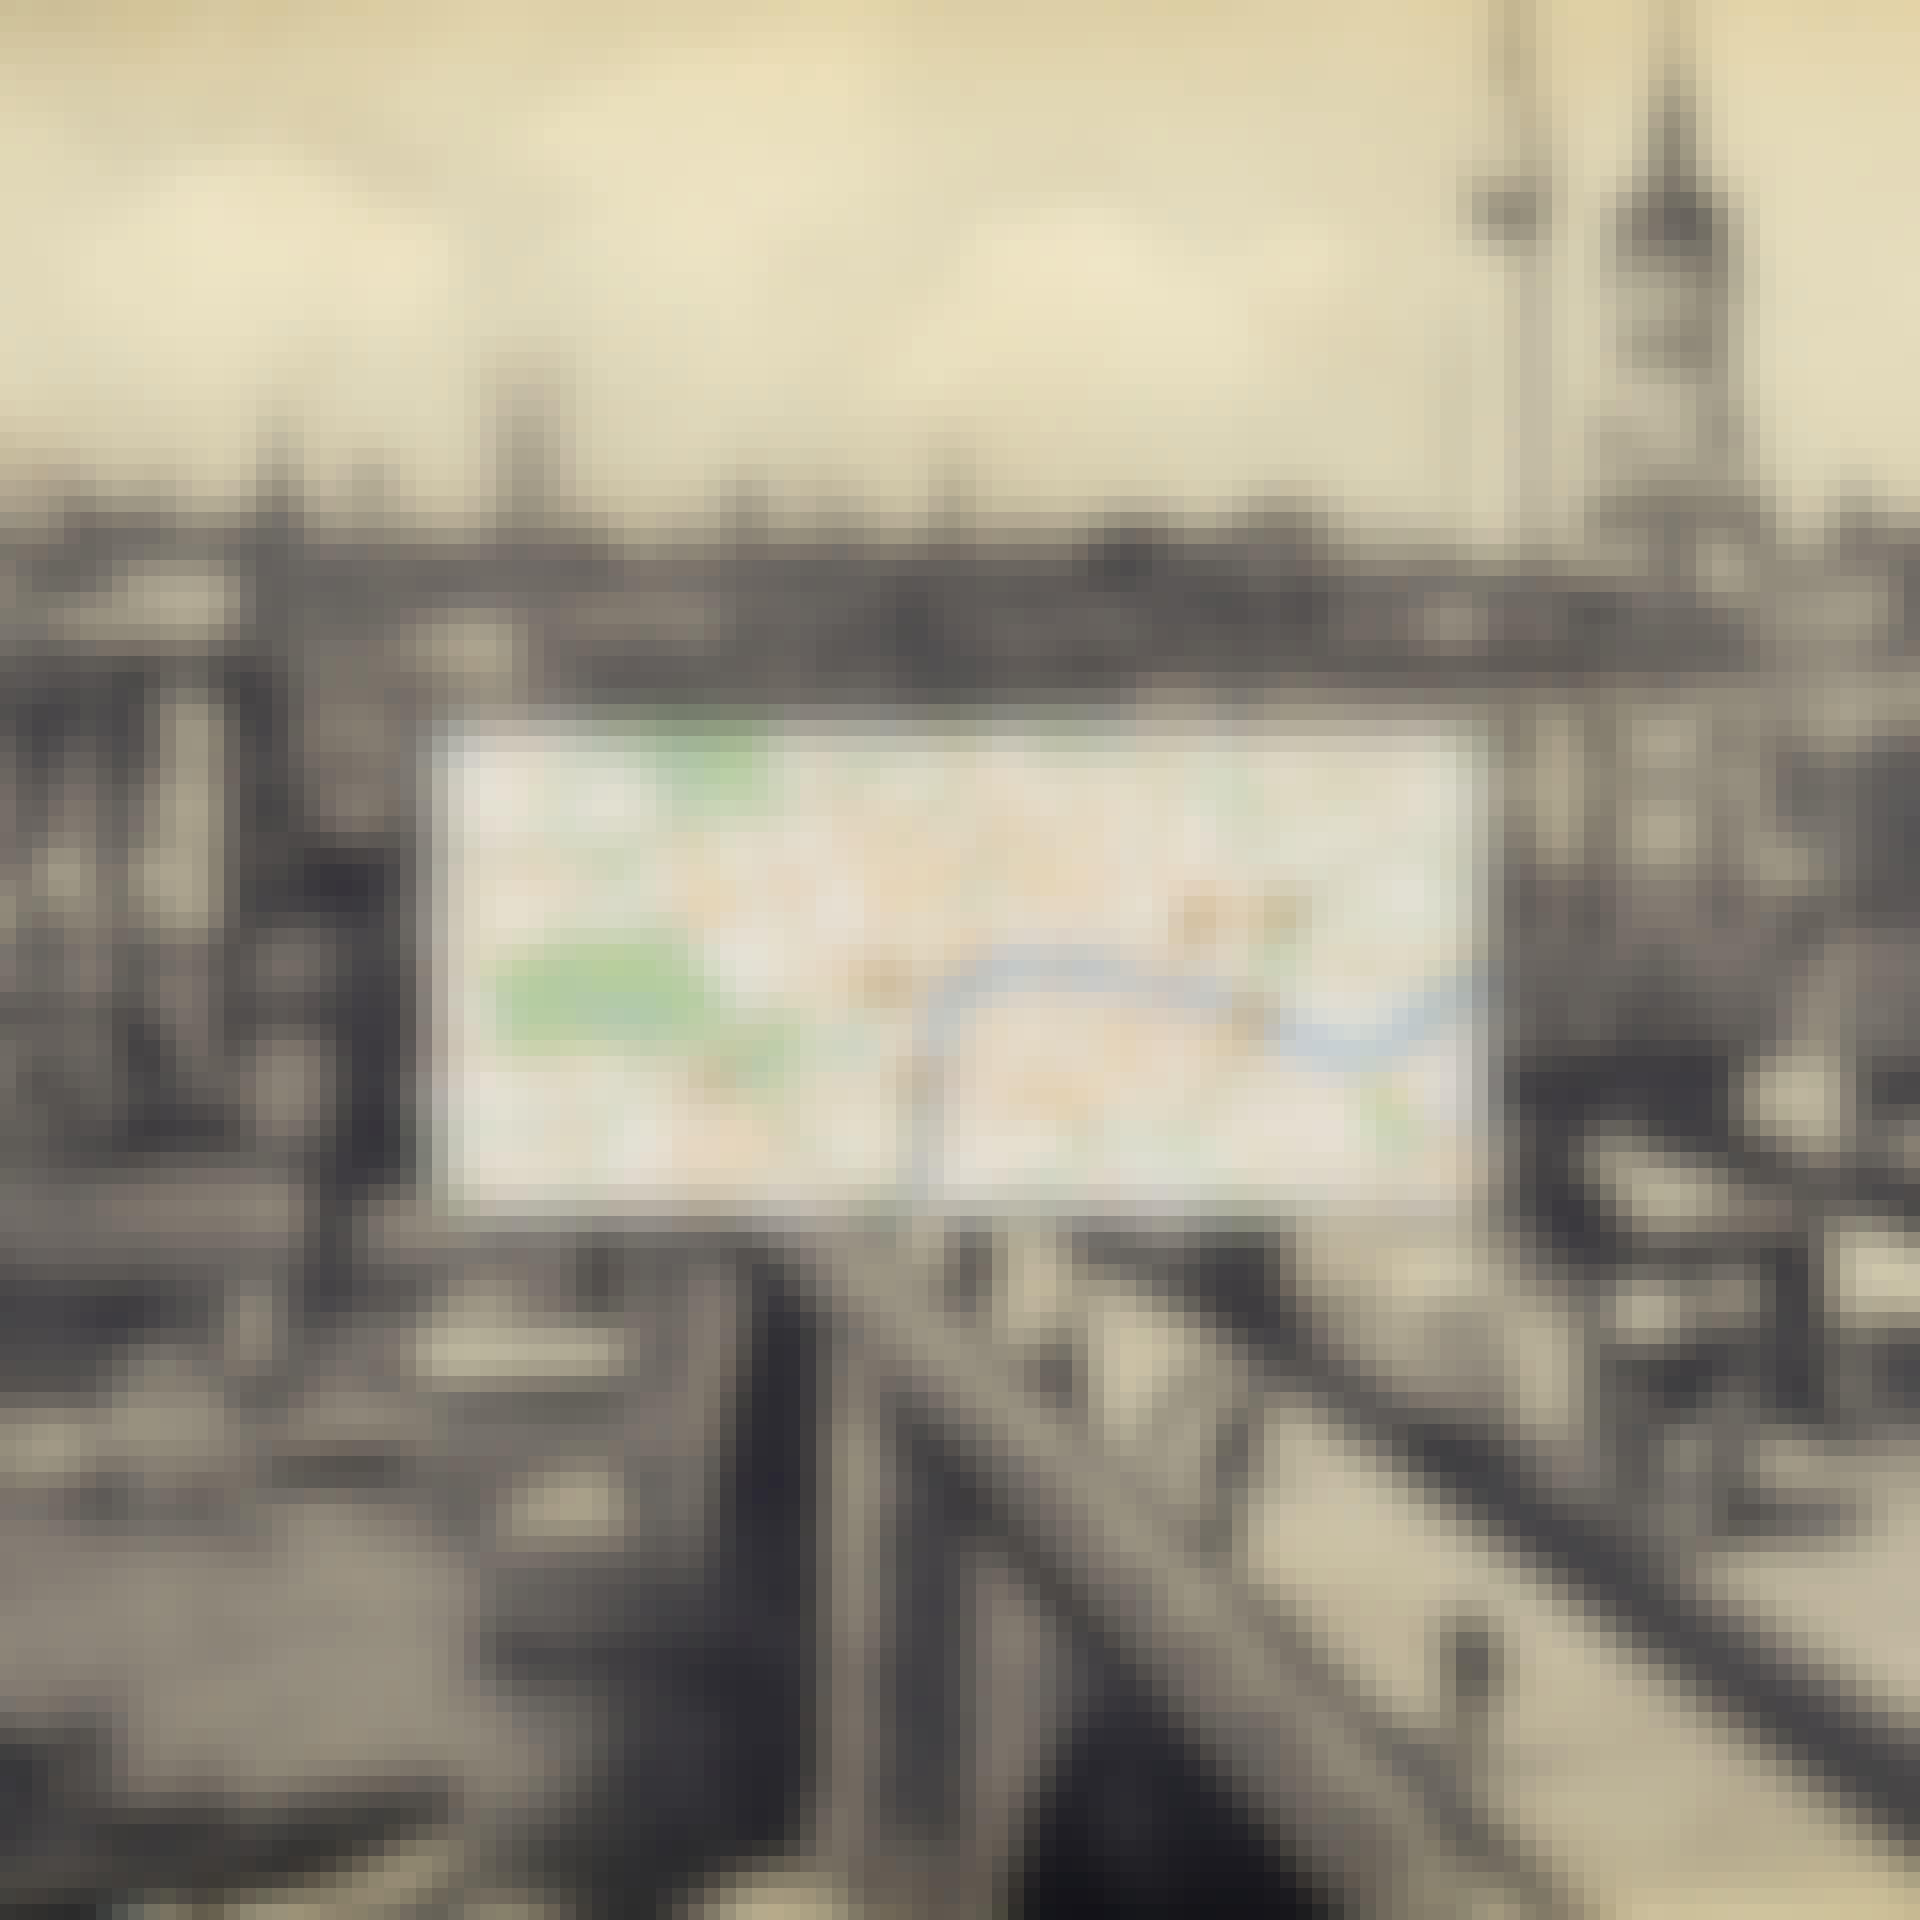 Lontoon kartta